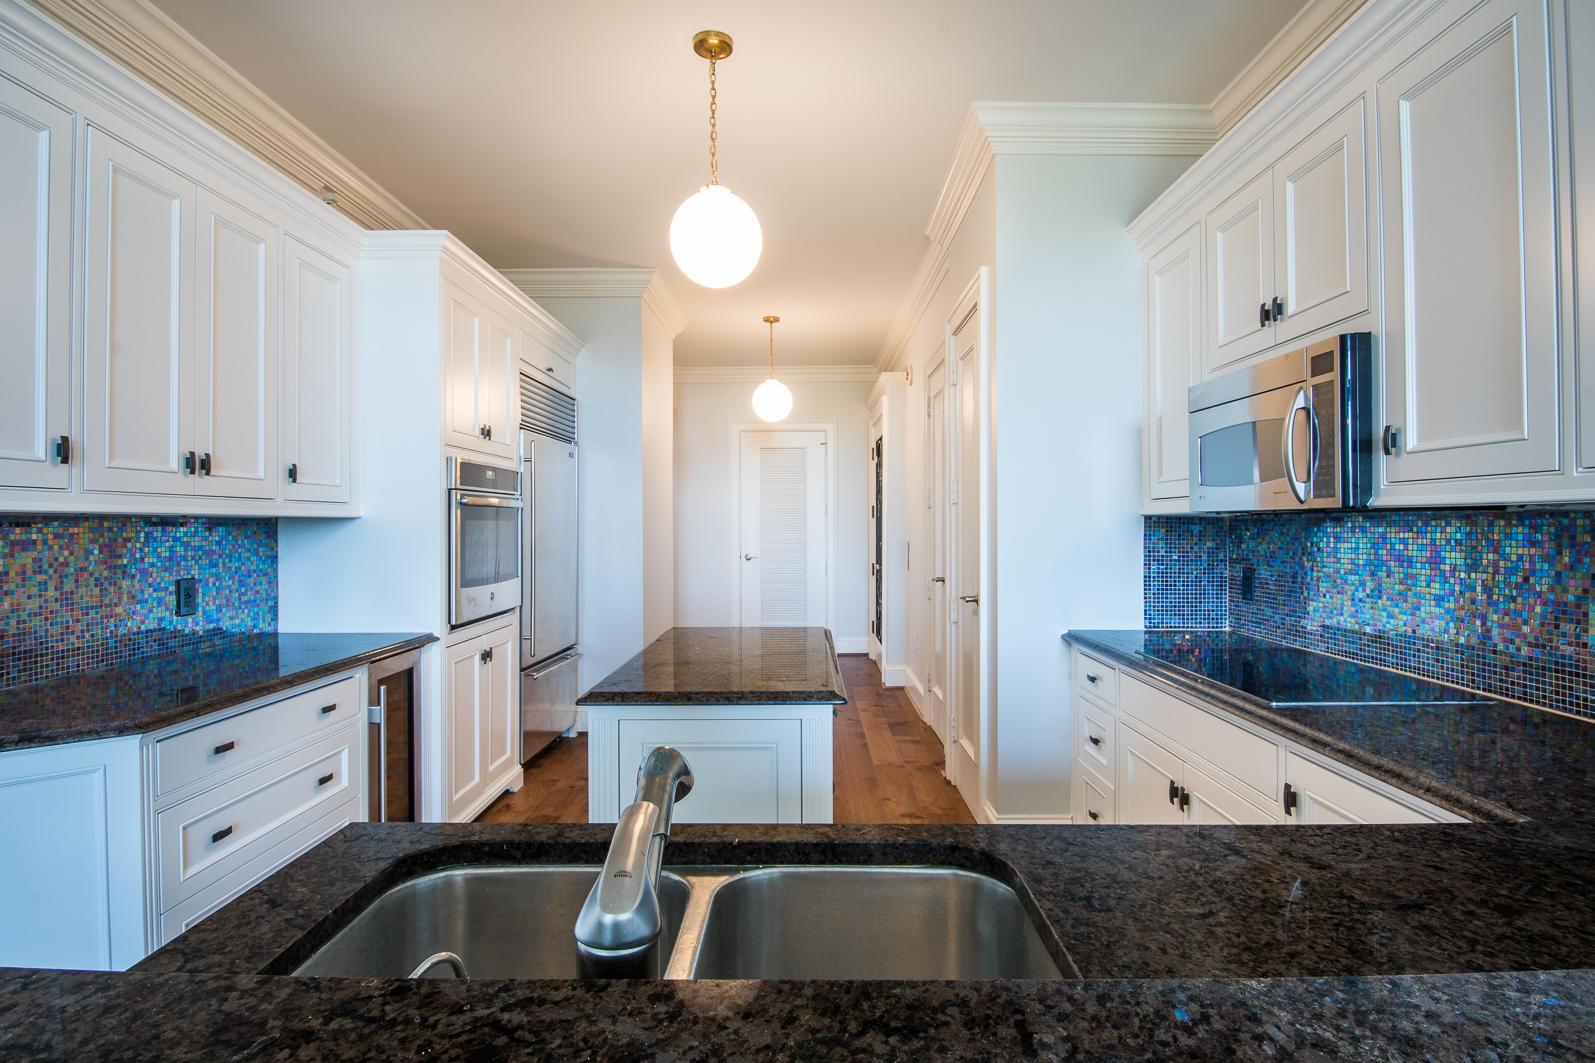 Renaissance On Chas Harbor Homes For Sale - 144 Plaza, Mount Pleasant, SC - 27